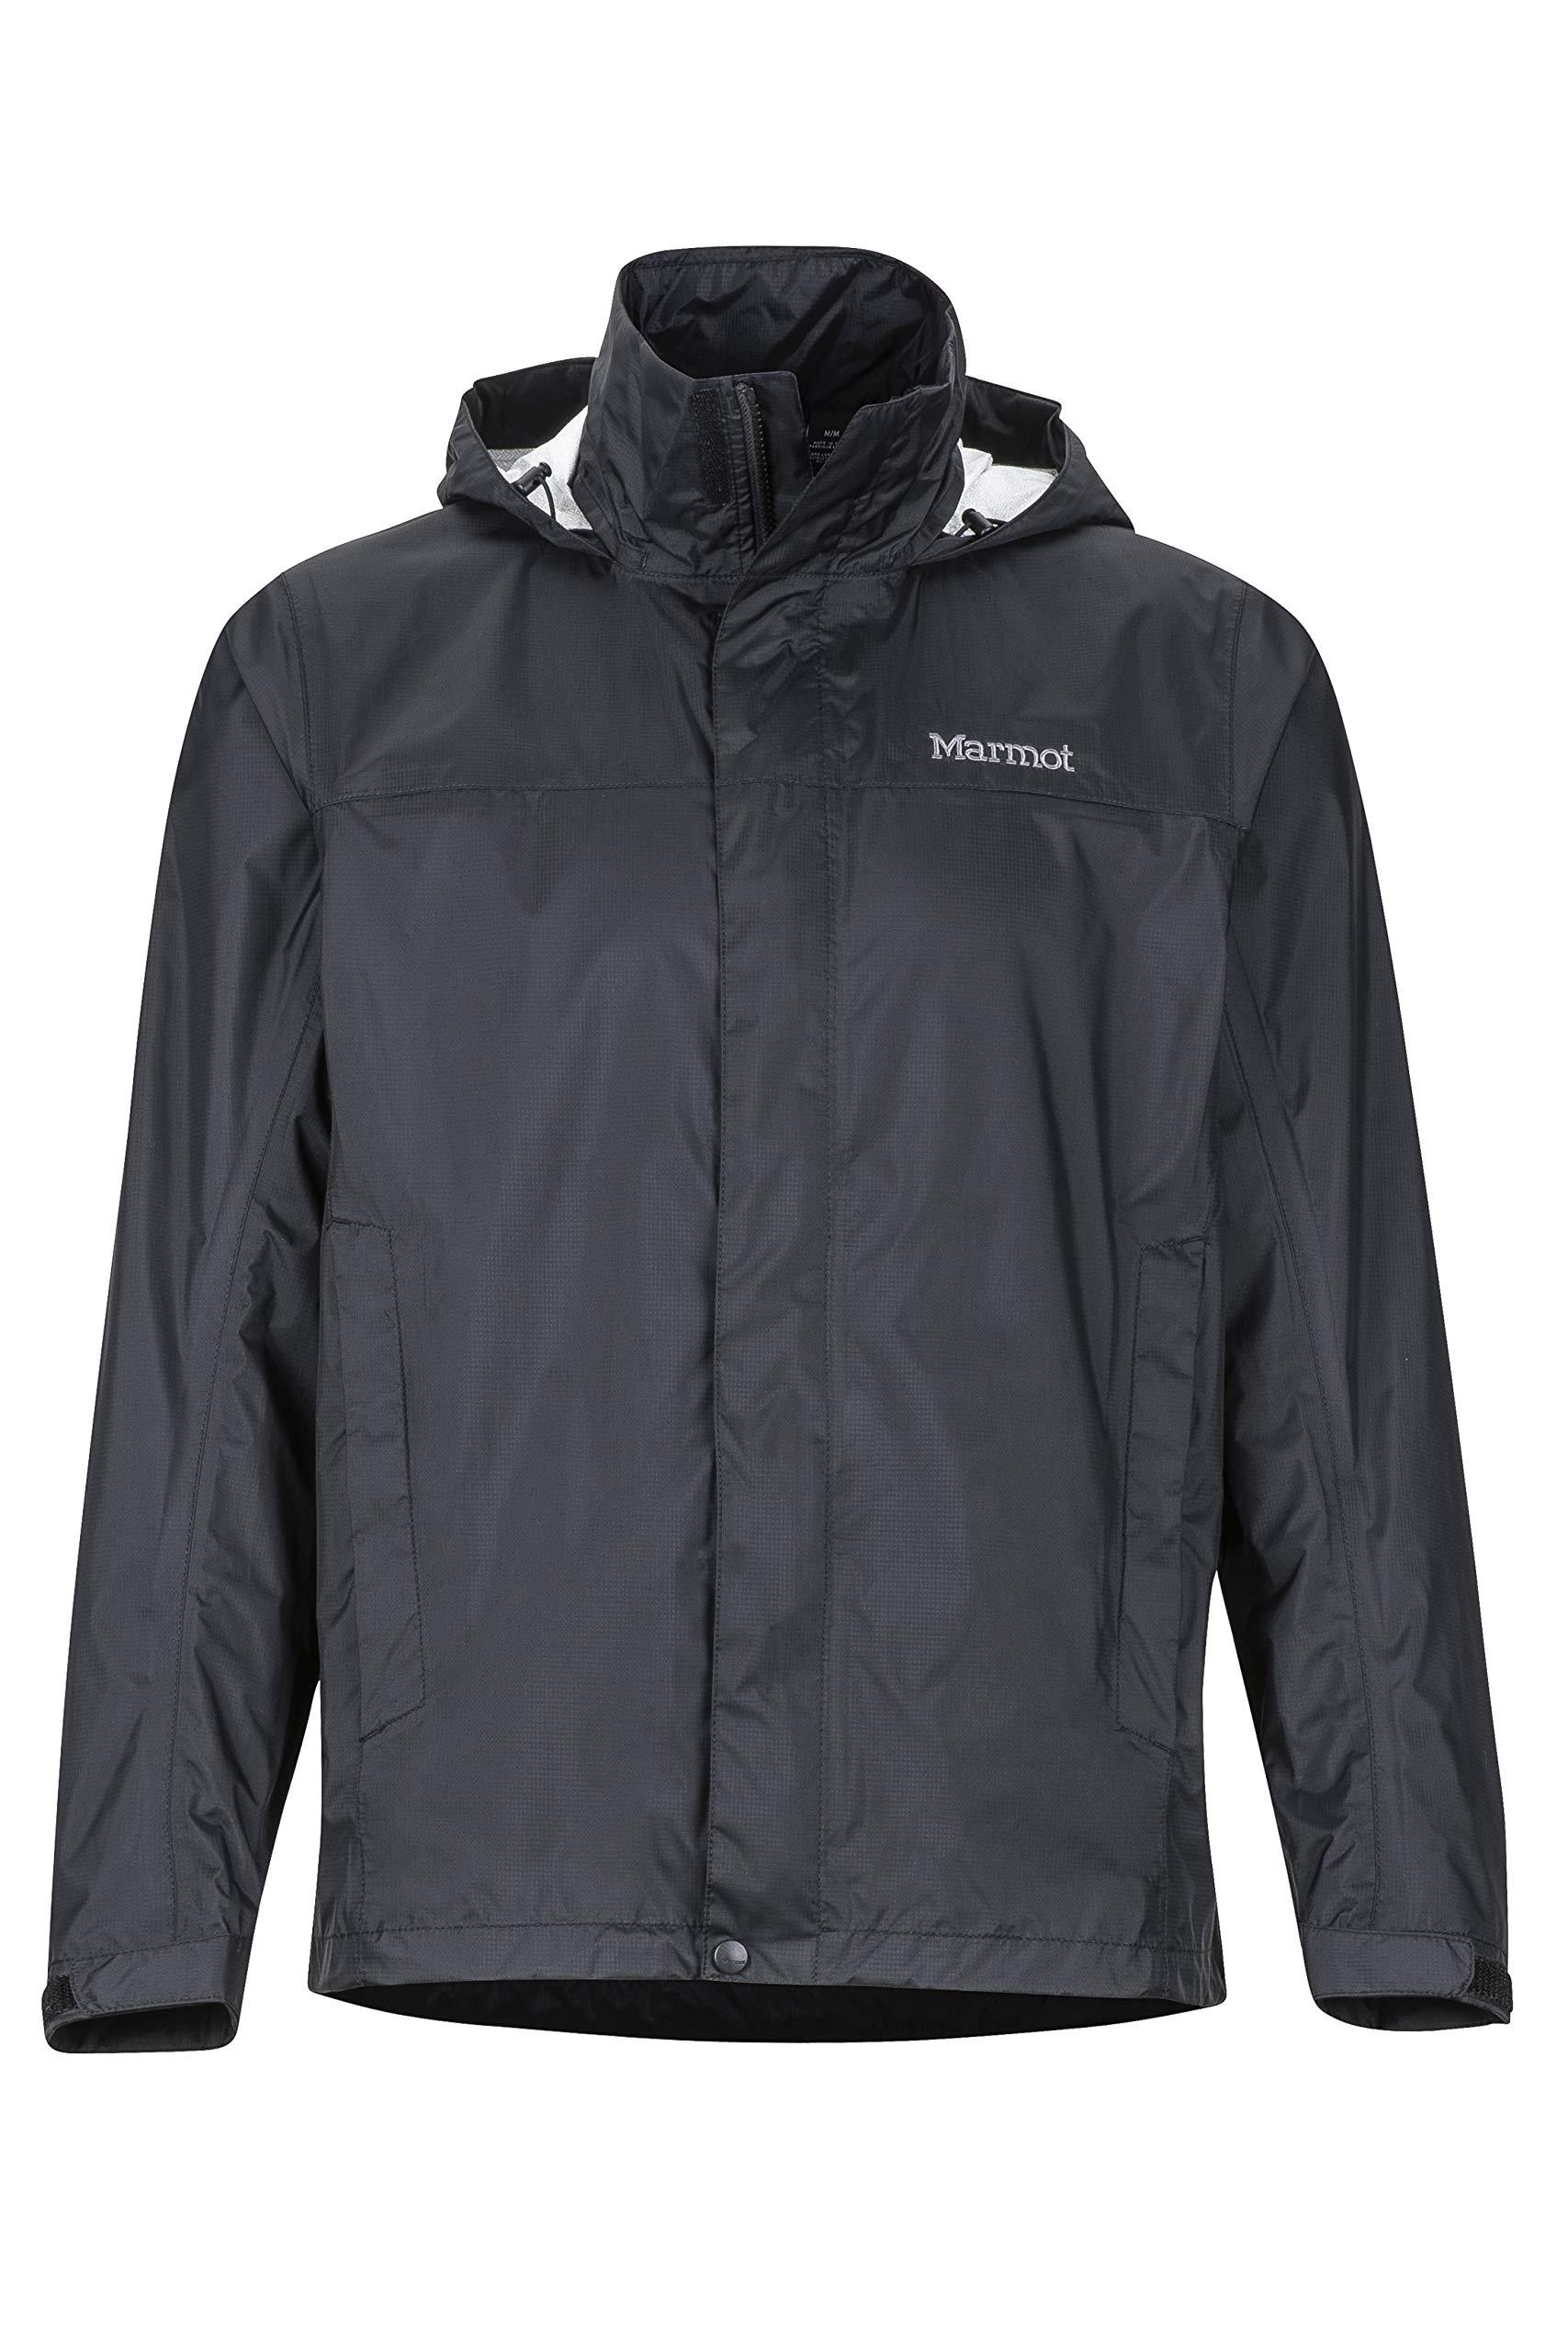 Marmot Men's Precip Jacket, Black, 3X-Large by Marmot